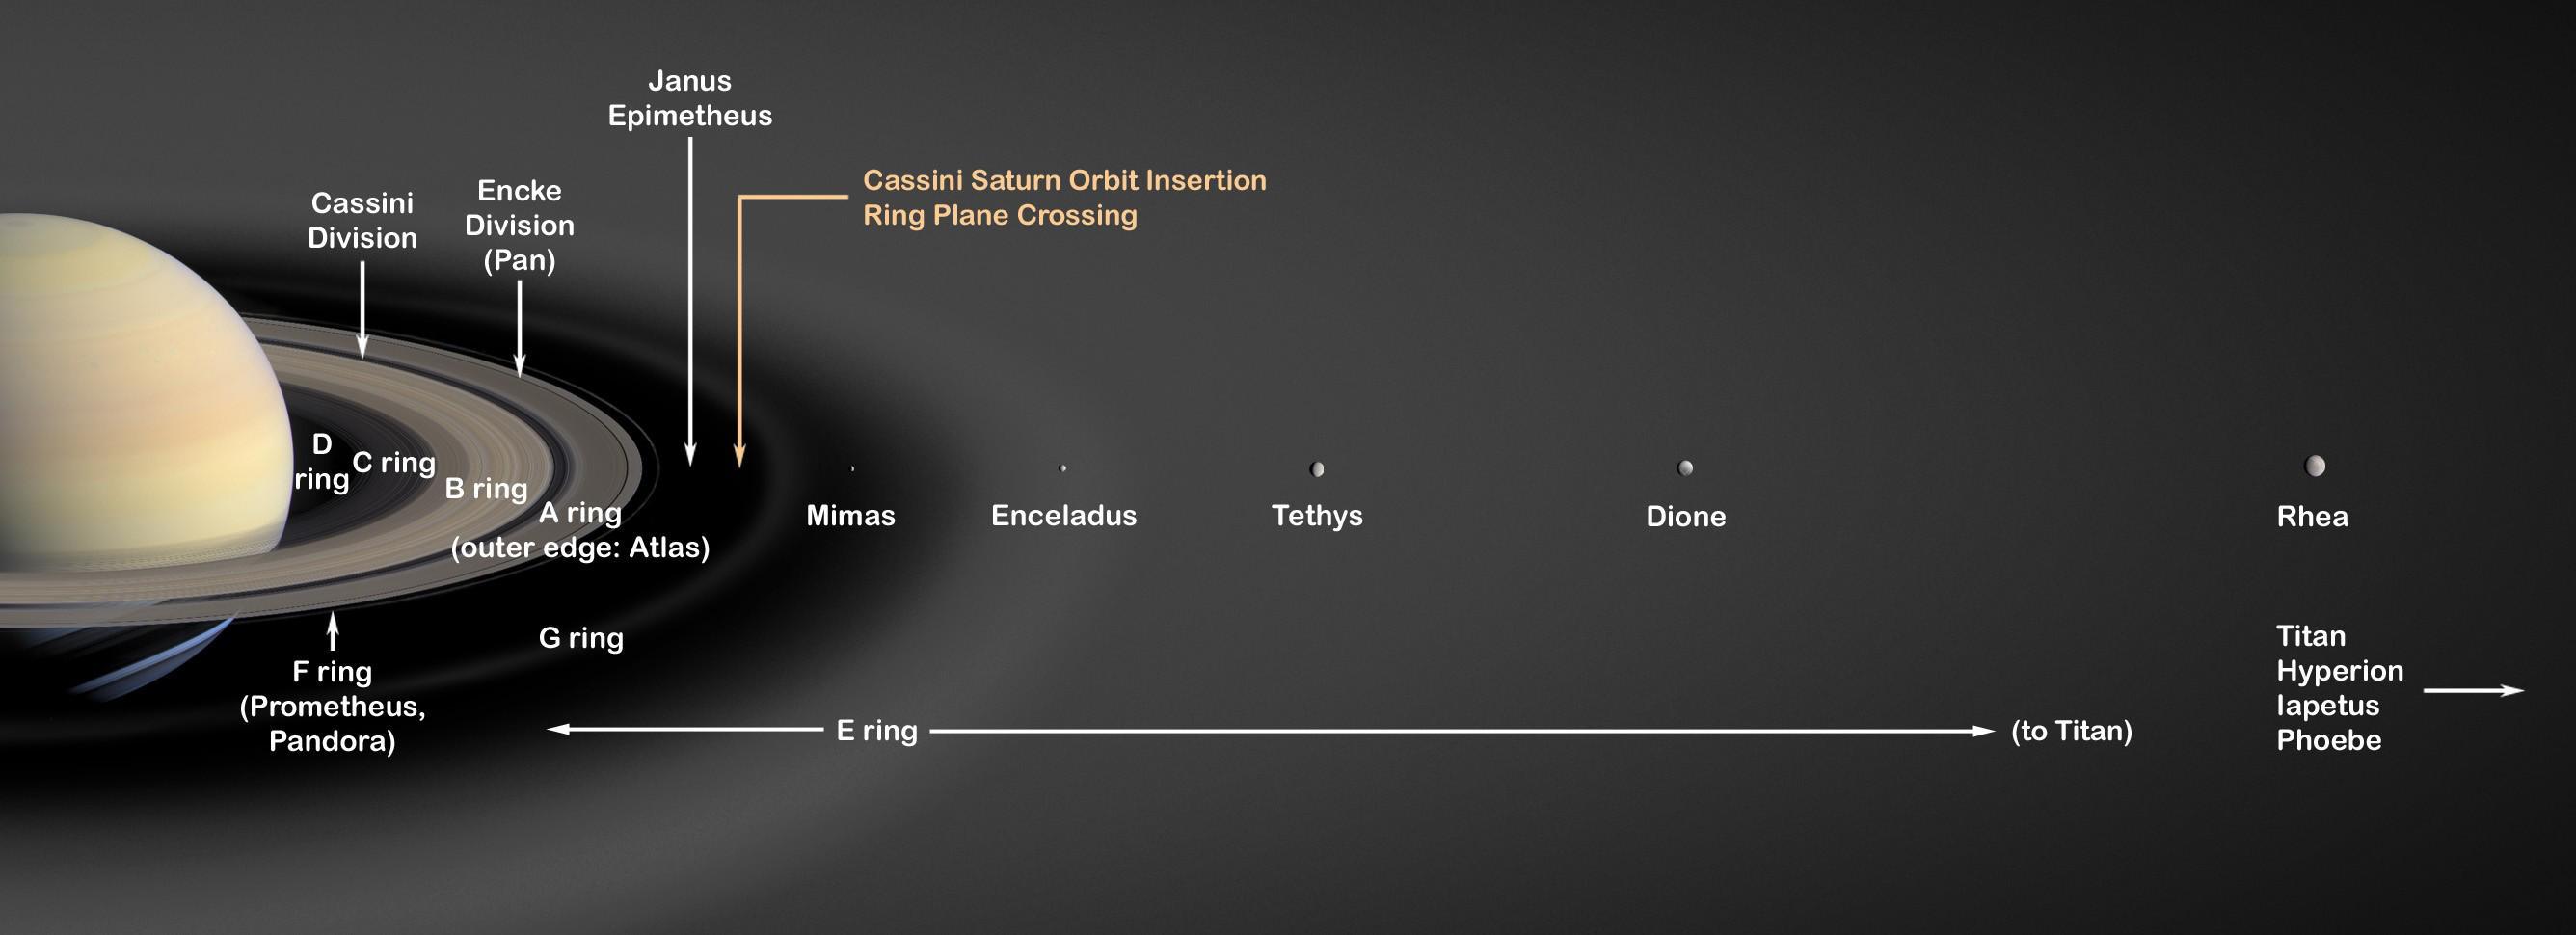 Moons of Saturn - Wikipedia